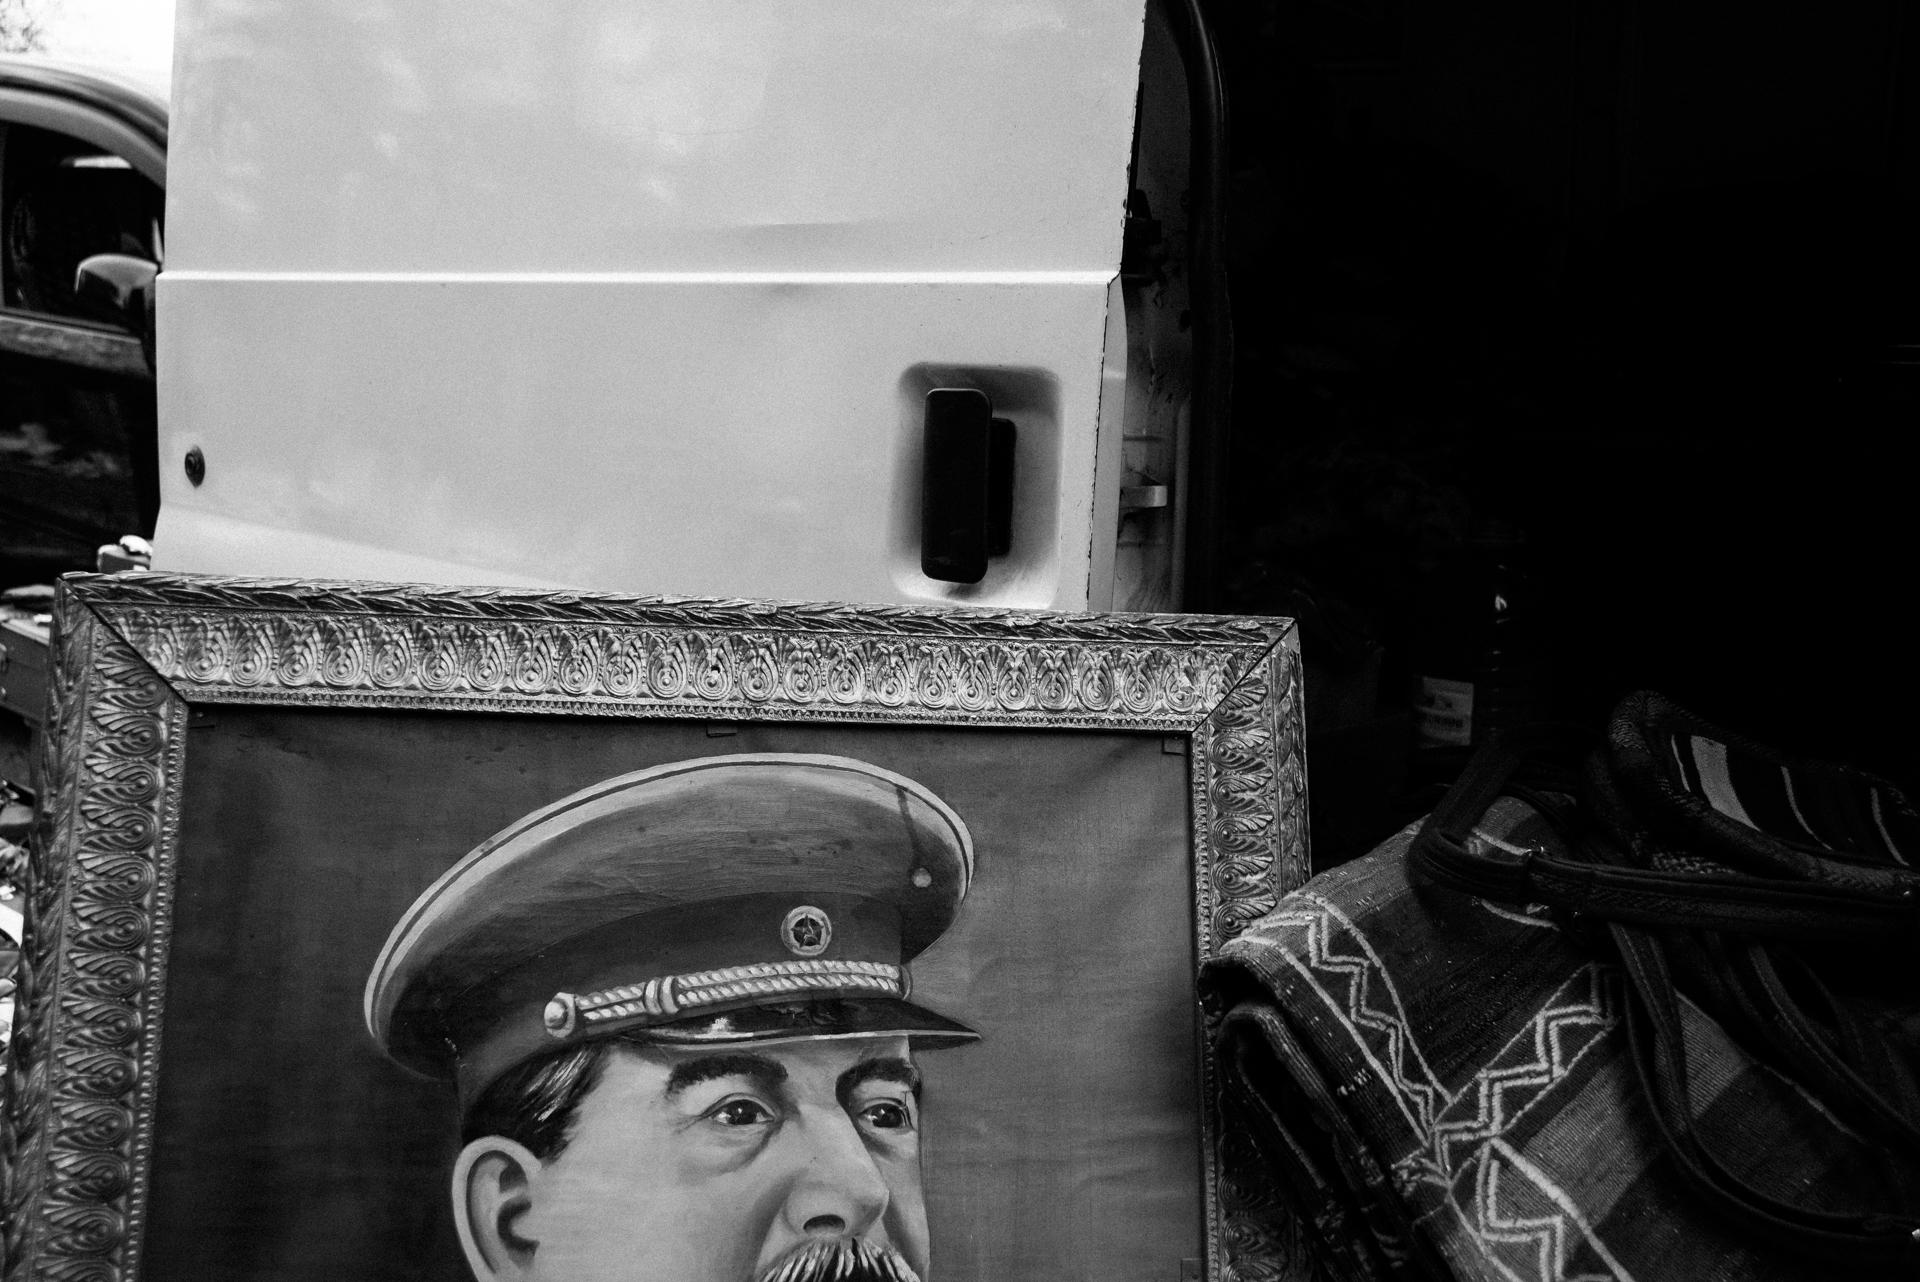 tbilisi-georgia-black-and-white-photography (1).jpg